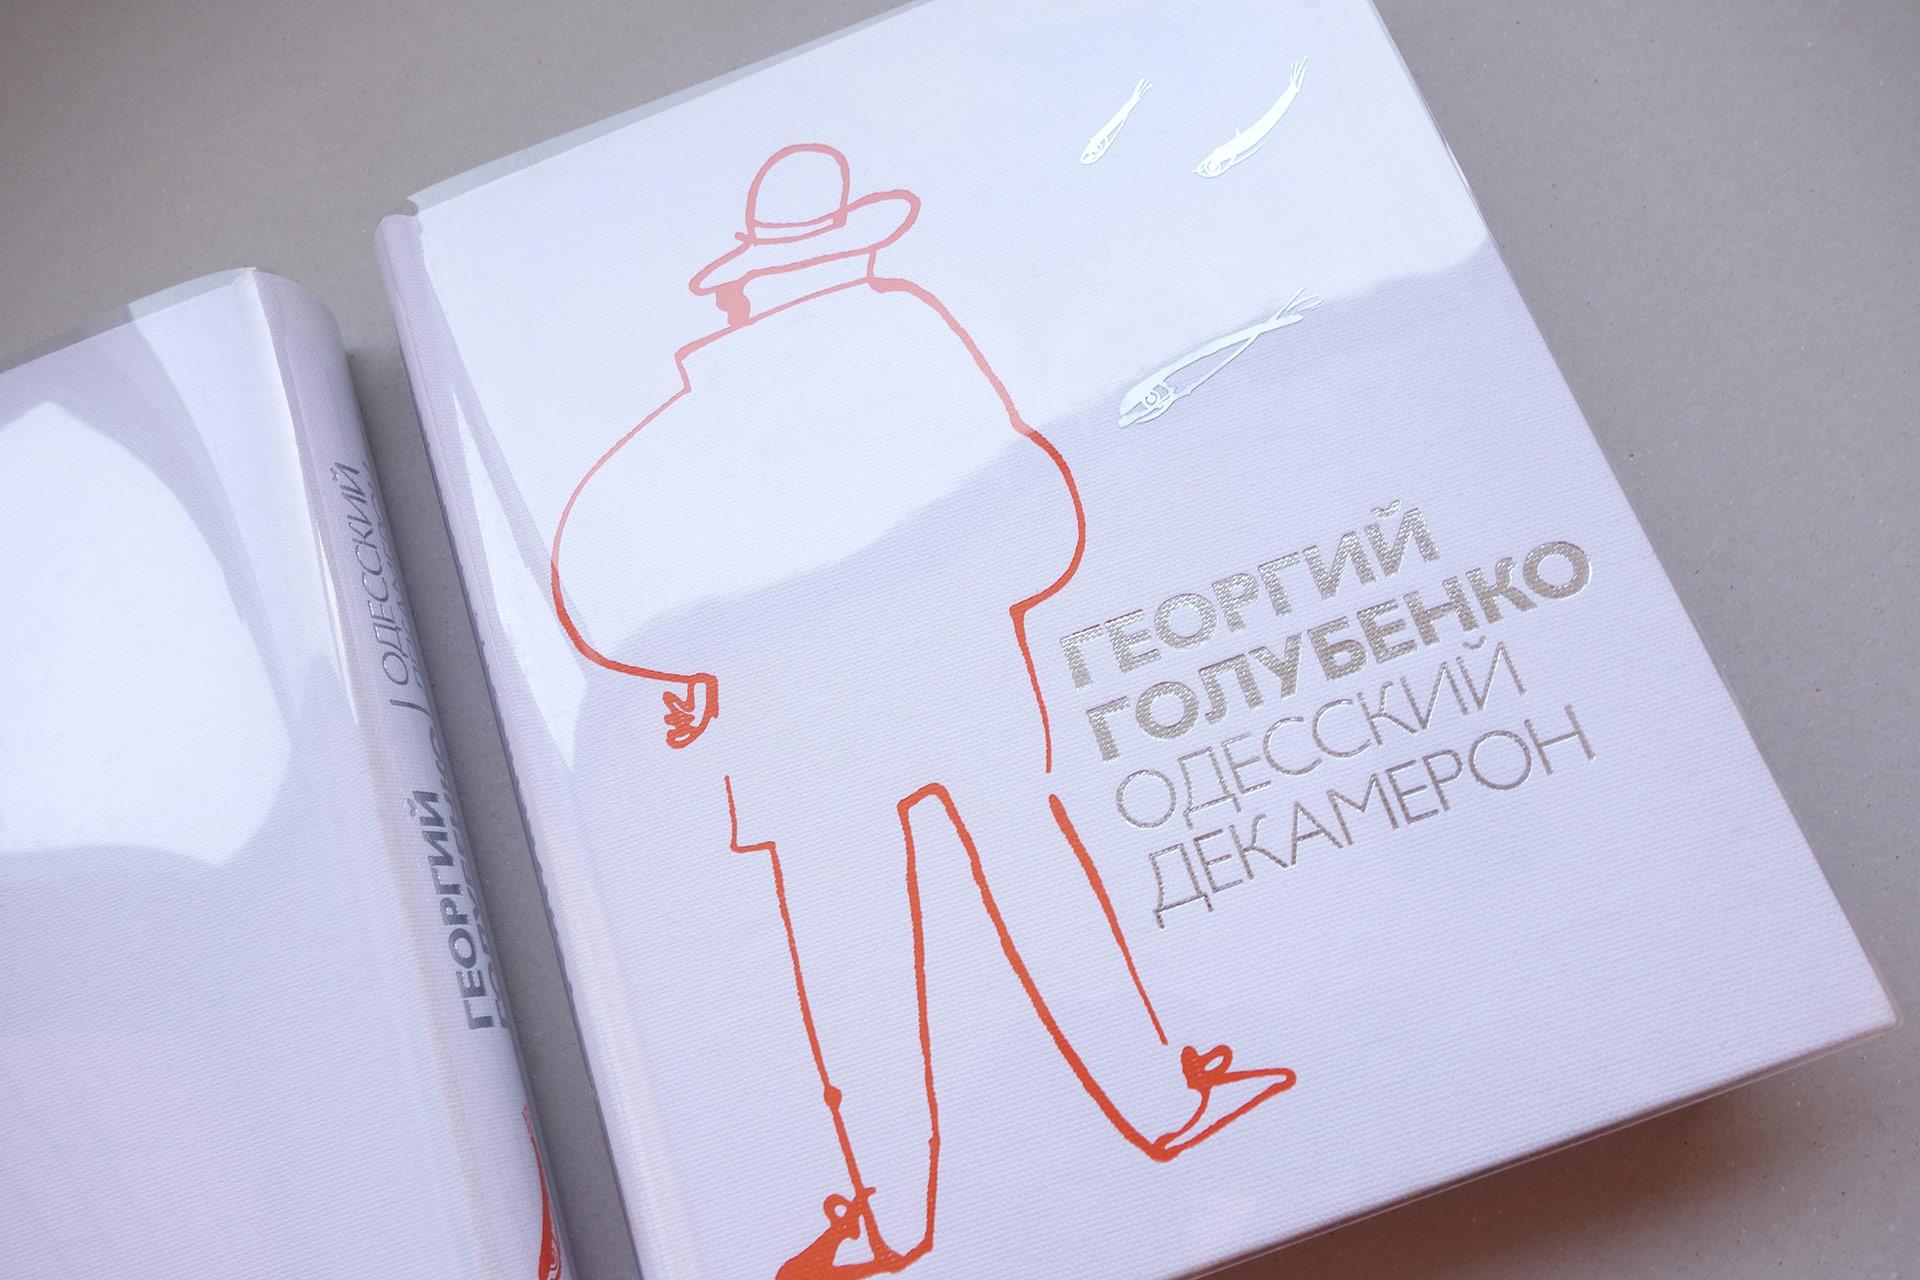 Asgard Branding, anniversary album, cover design, print, printed publications, book design, George Golubenko, Michael Reva, illustrations